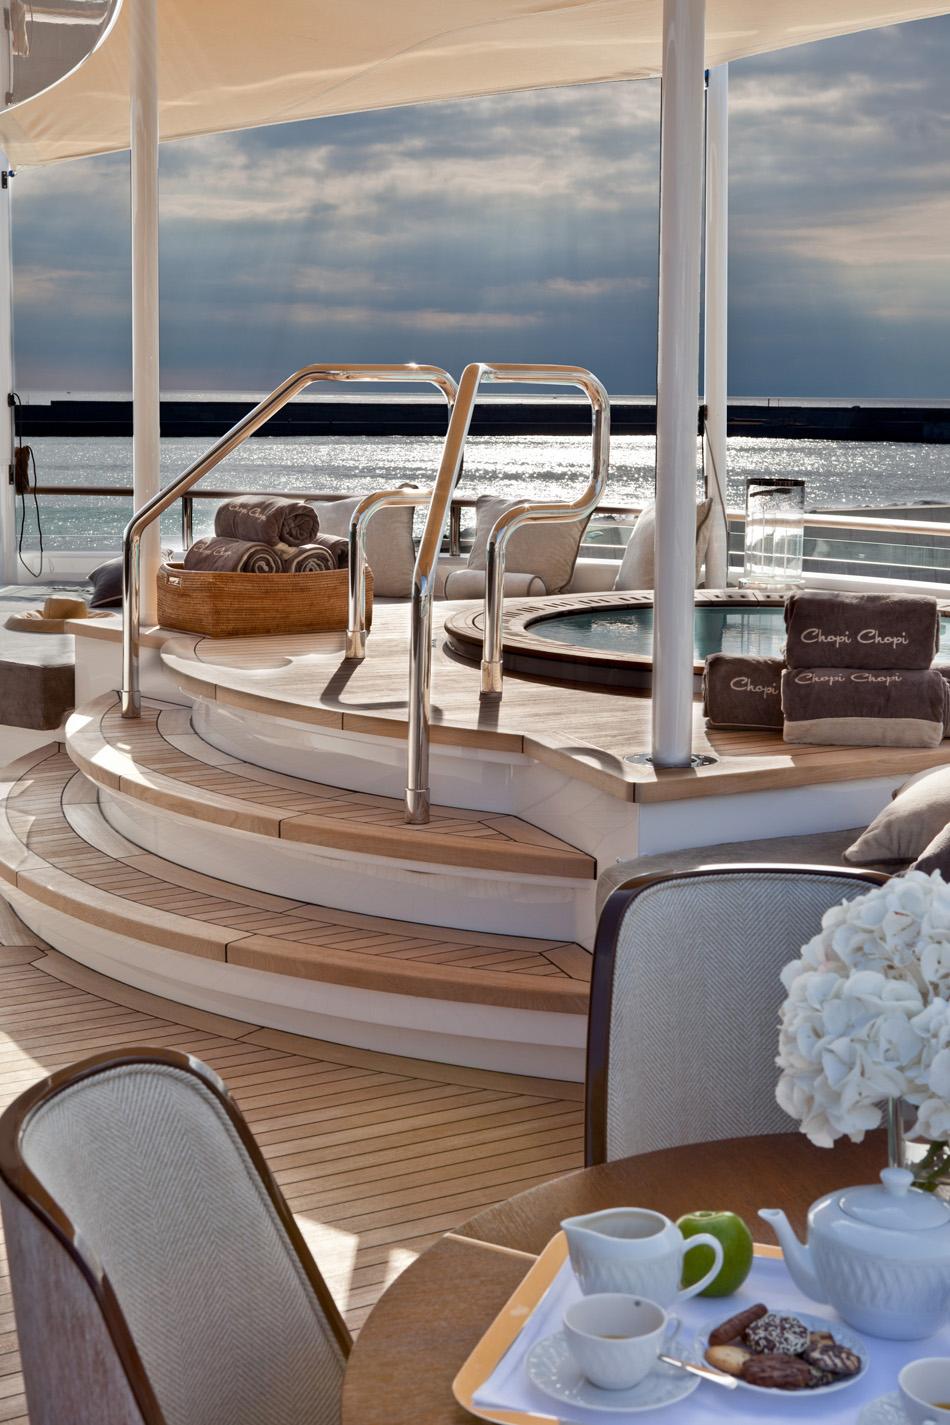 crn-mega-yachts-chopi-chopi-designboomg06